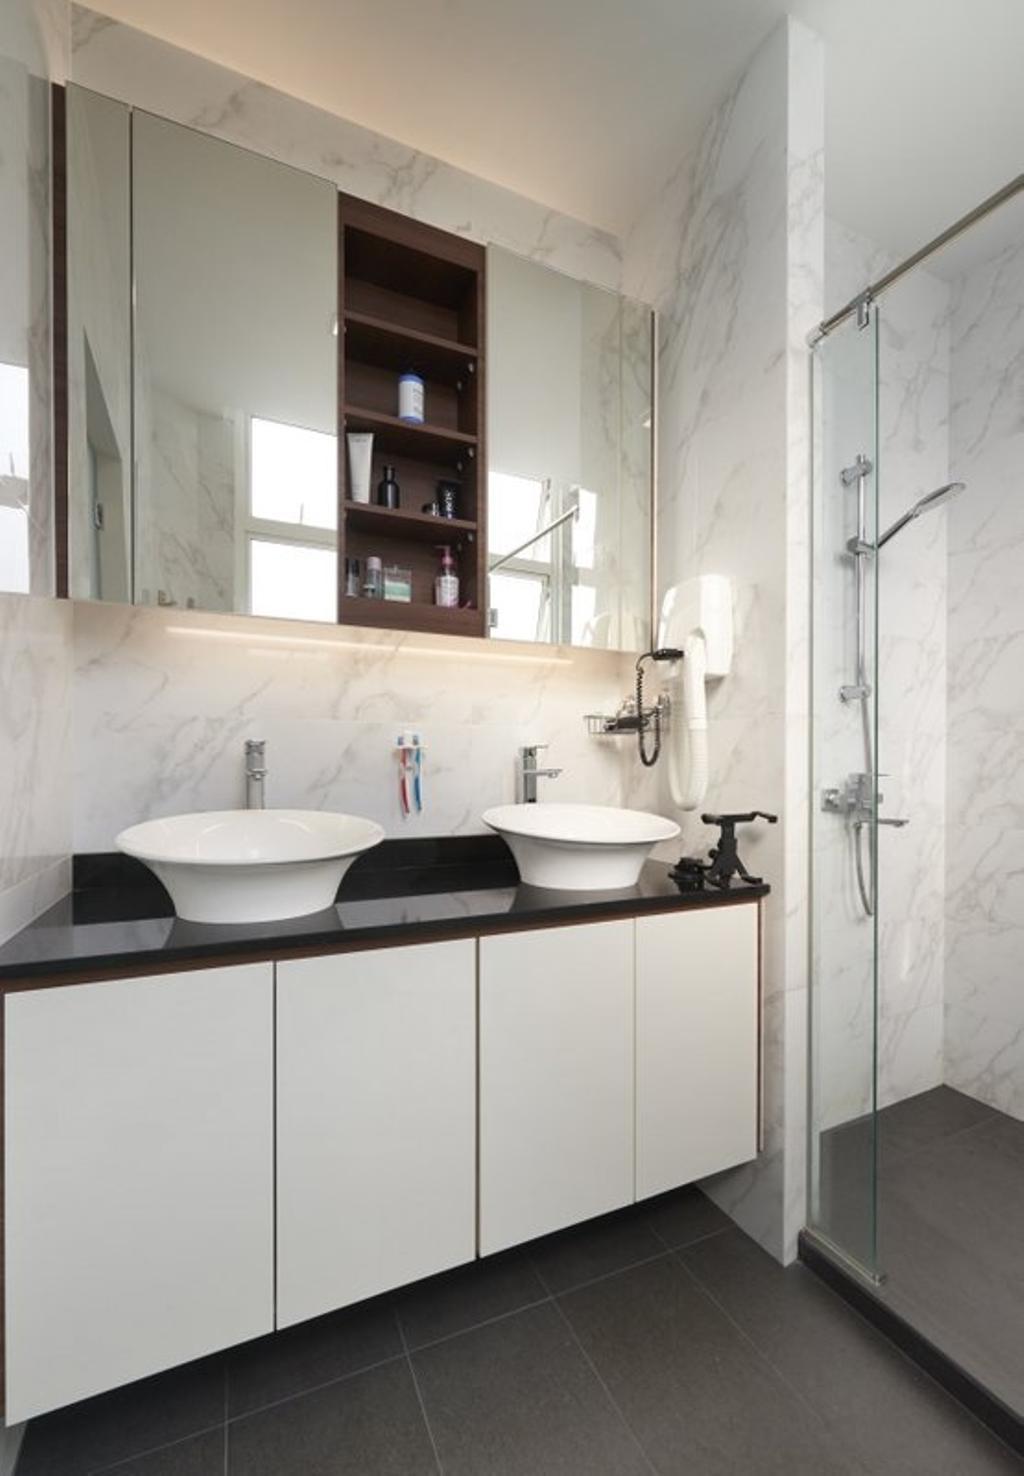 Minimalist, Landed, Bathroom, Burgundy (Bukit Batok), Interior Designer, Spire Id, Bathroom Vanities, Double Sink, Monochrome, Marble, Bathroom Tiles, Sink, Indoors, Interior Design, Room, Coffee Table, Furniture, Table